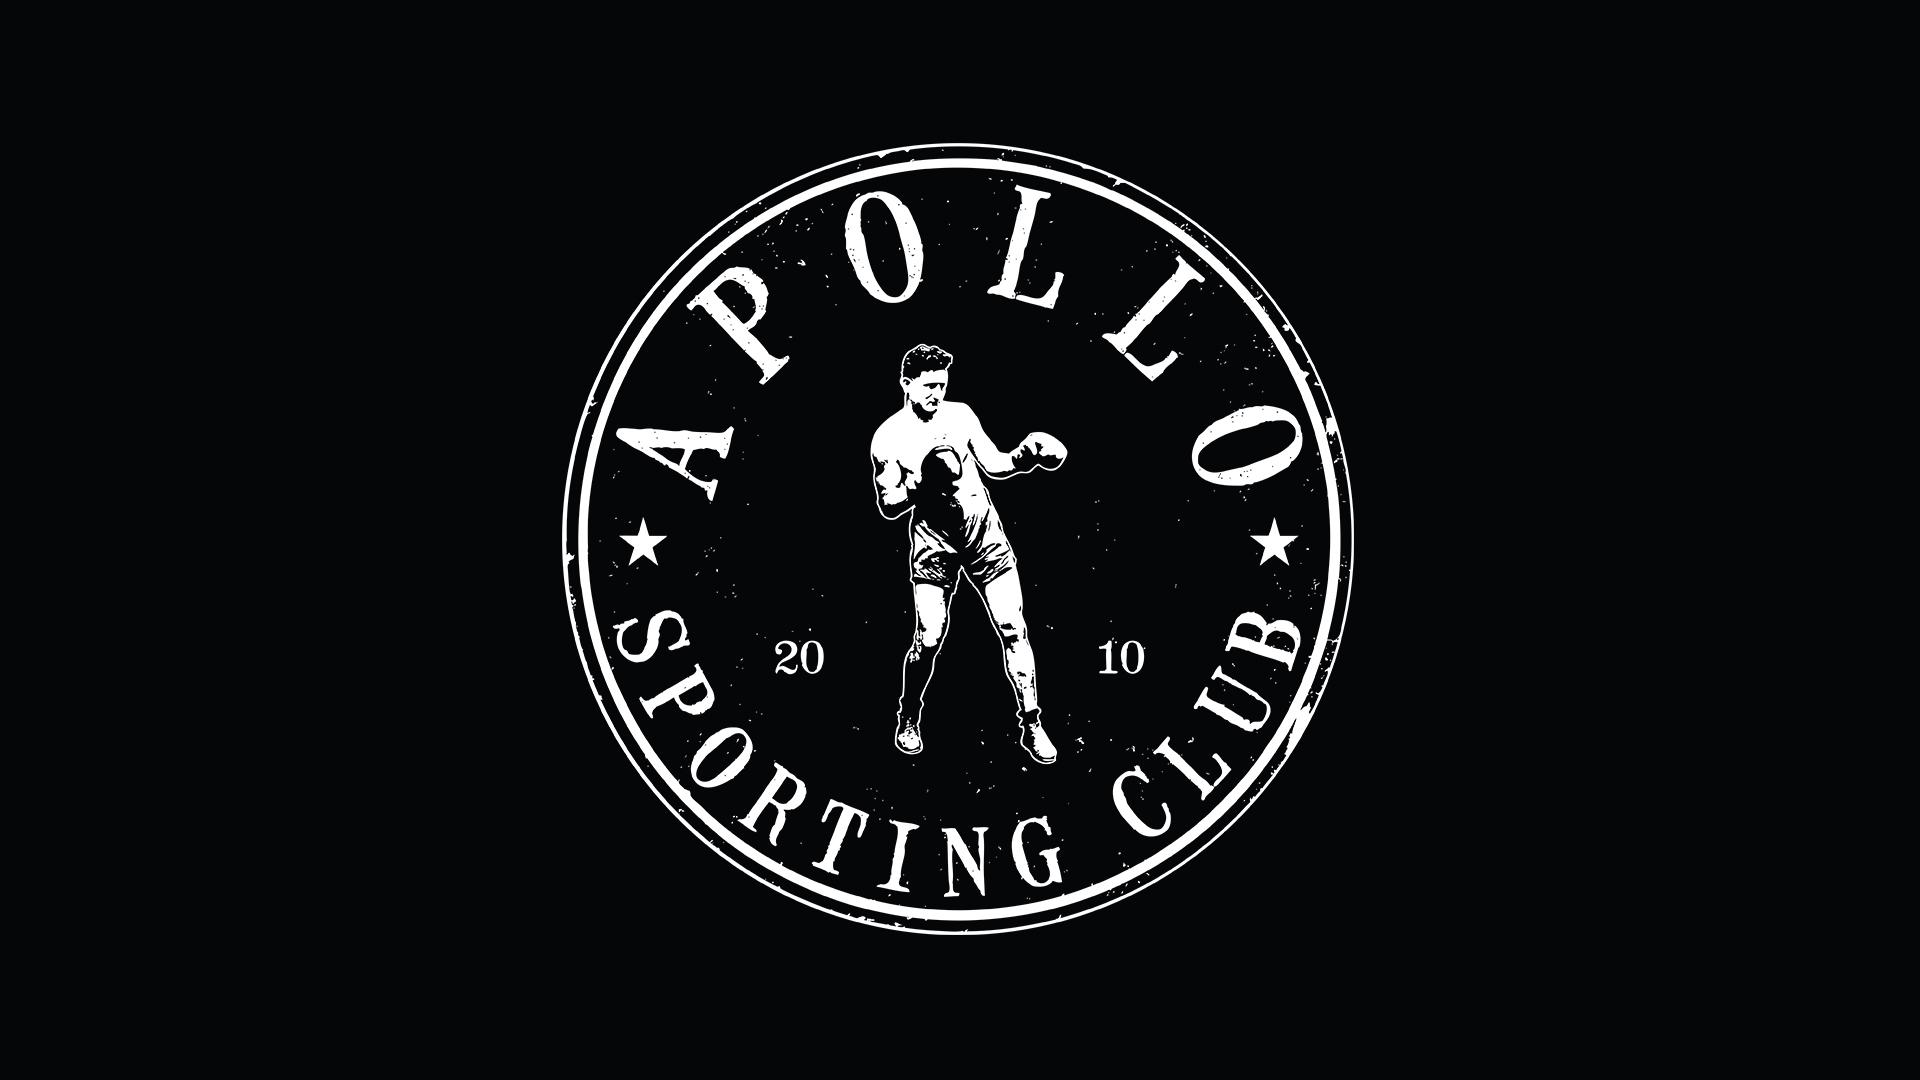 Appolo Sporting Club